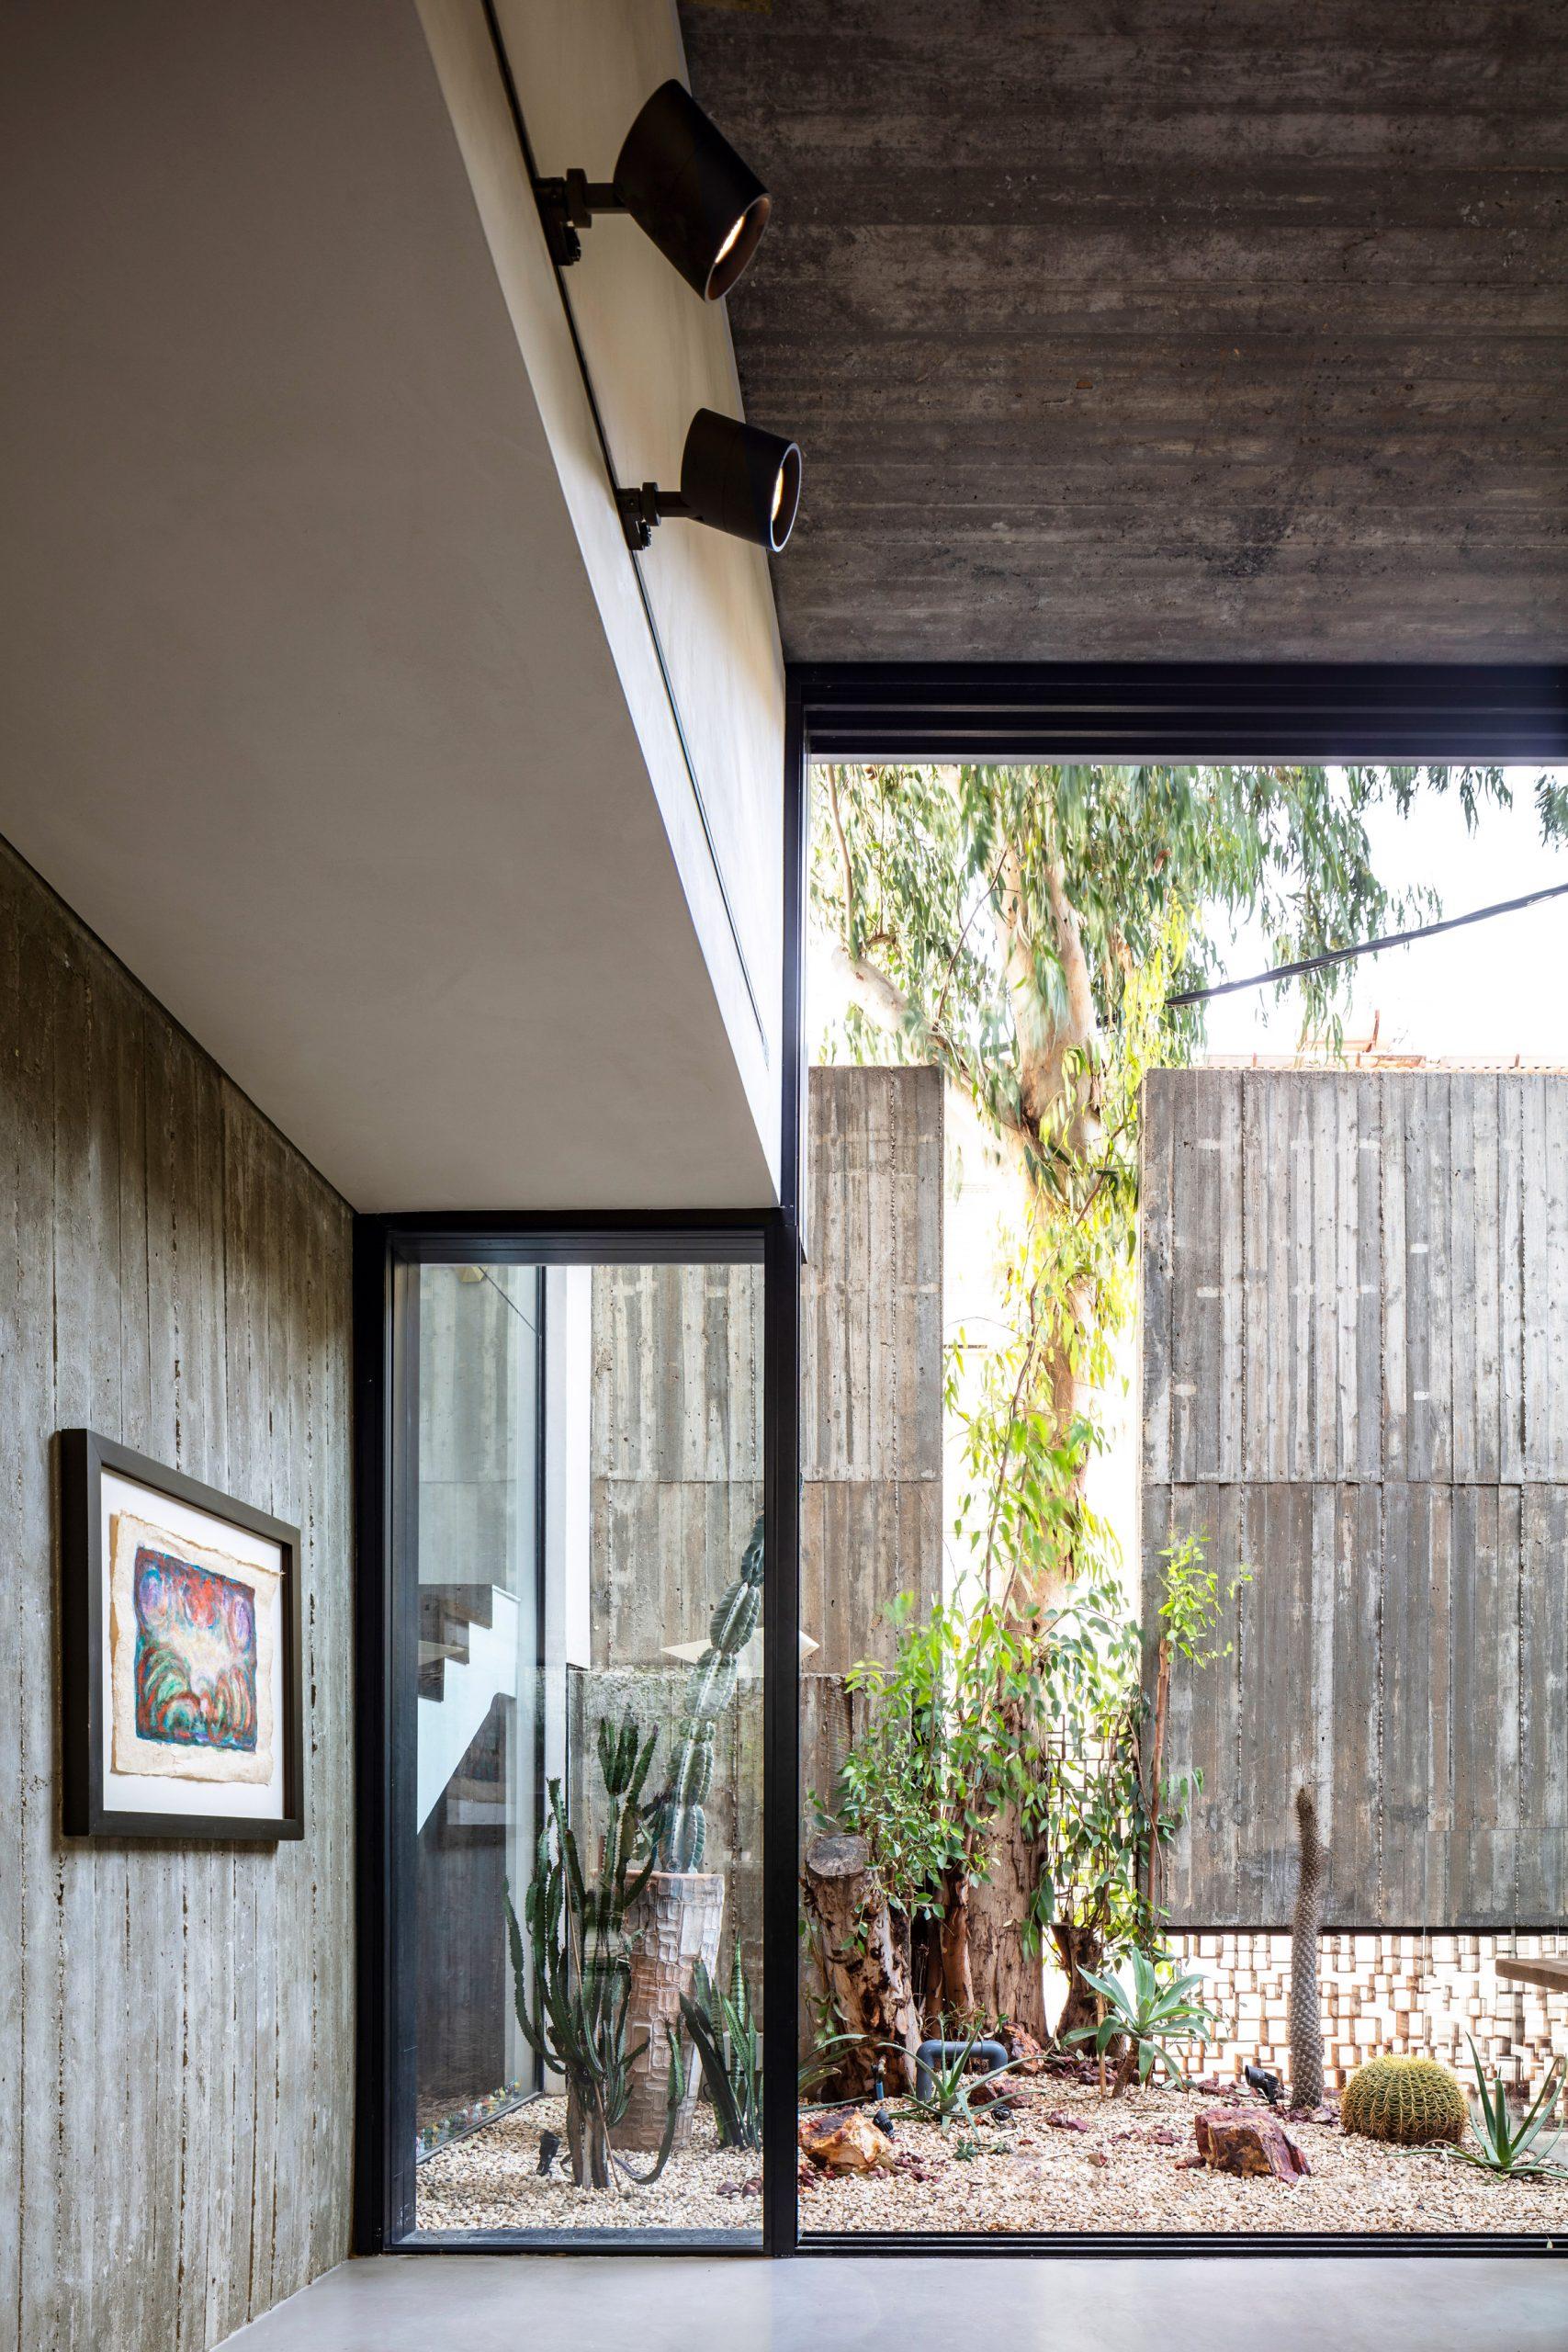 Zen garden at Eucalyptus House by Paritzki & Liani Architects